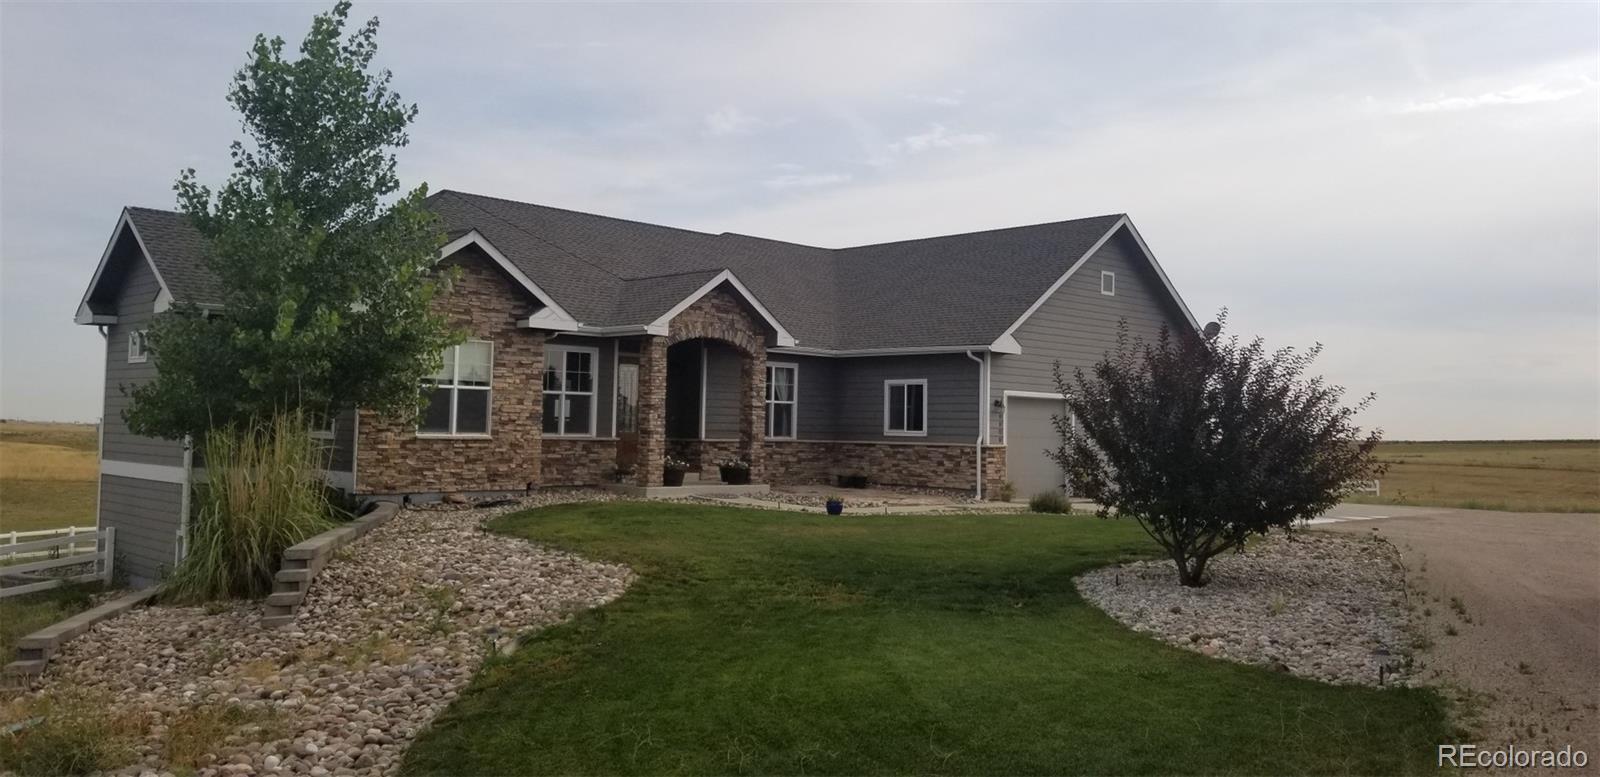 38909 E 145th Avenue, Keenesburg, CO 80643 - Keenesburg, CO real estate listing